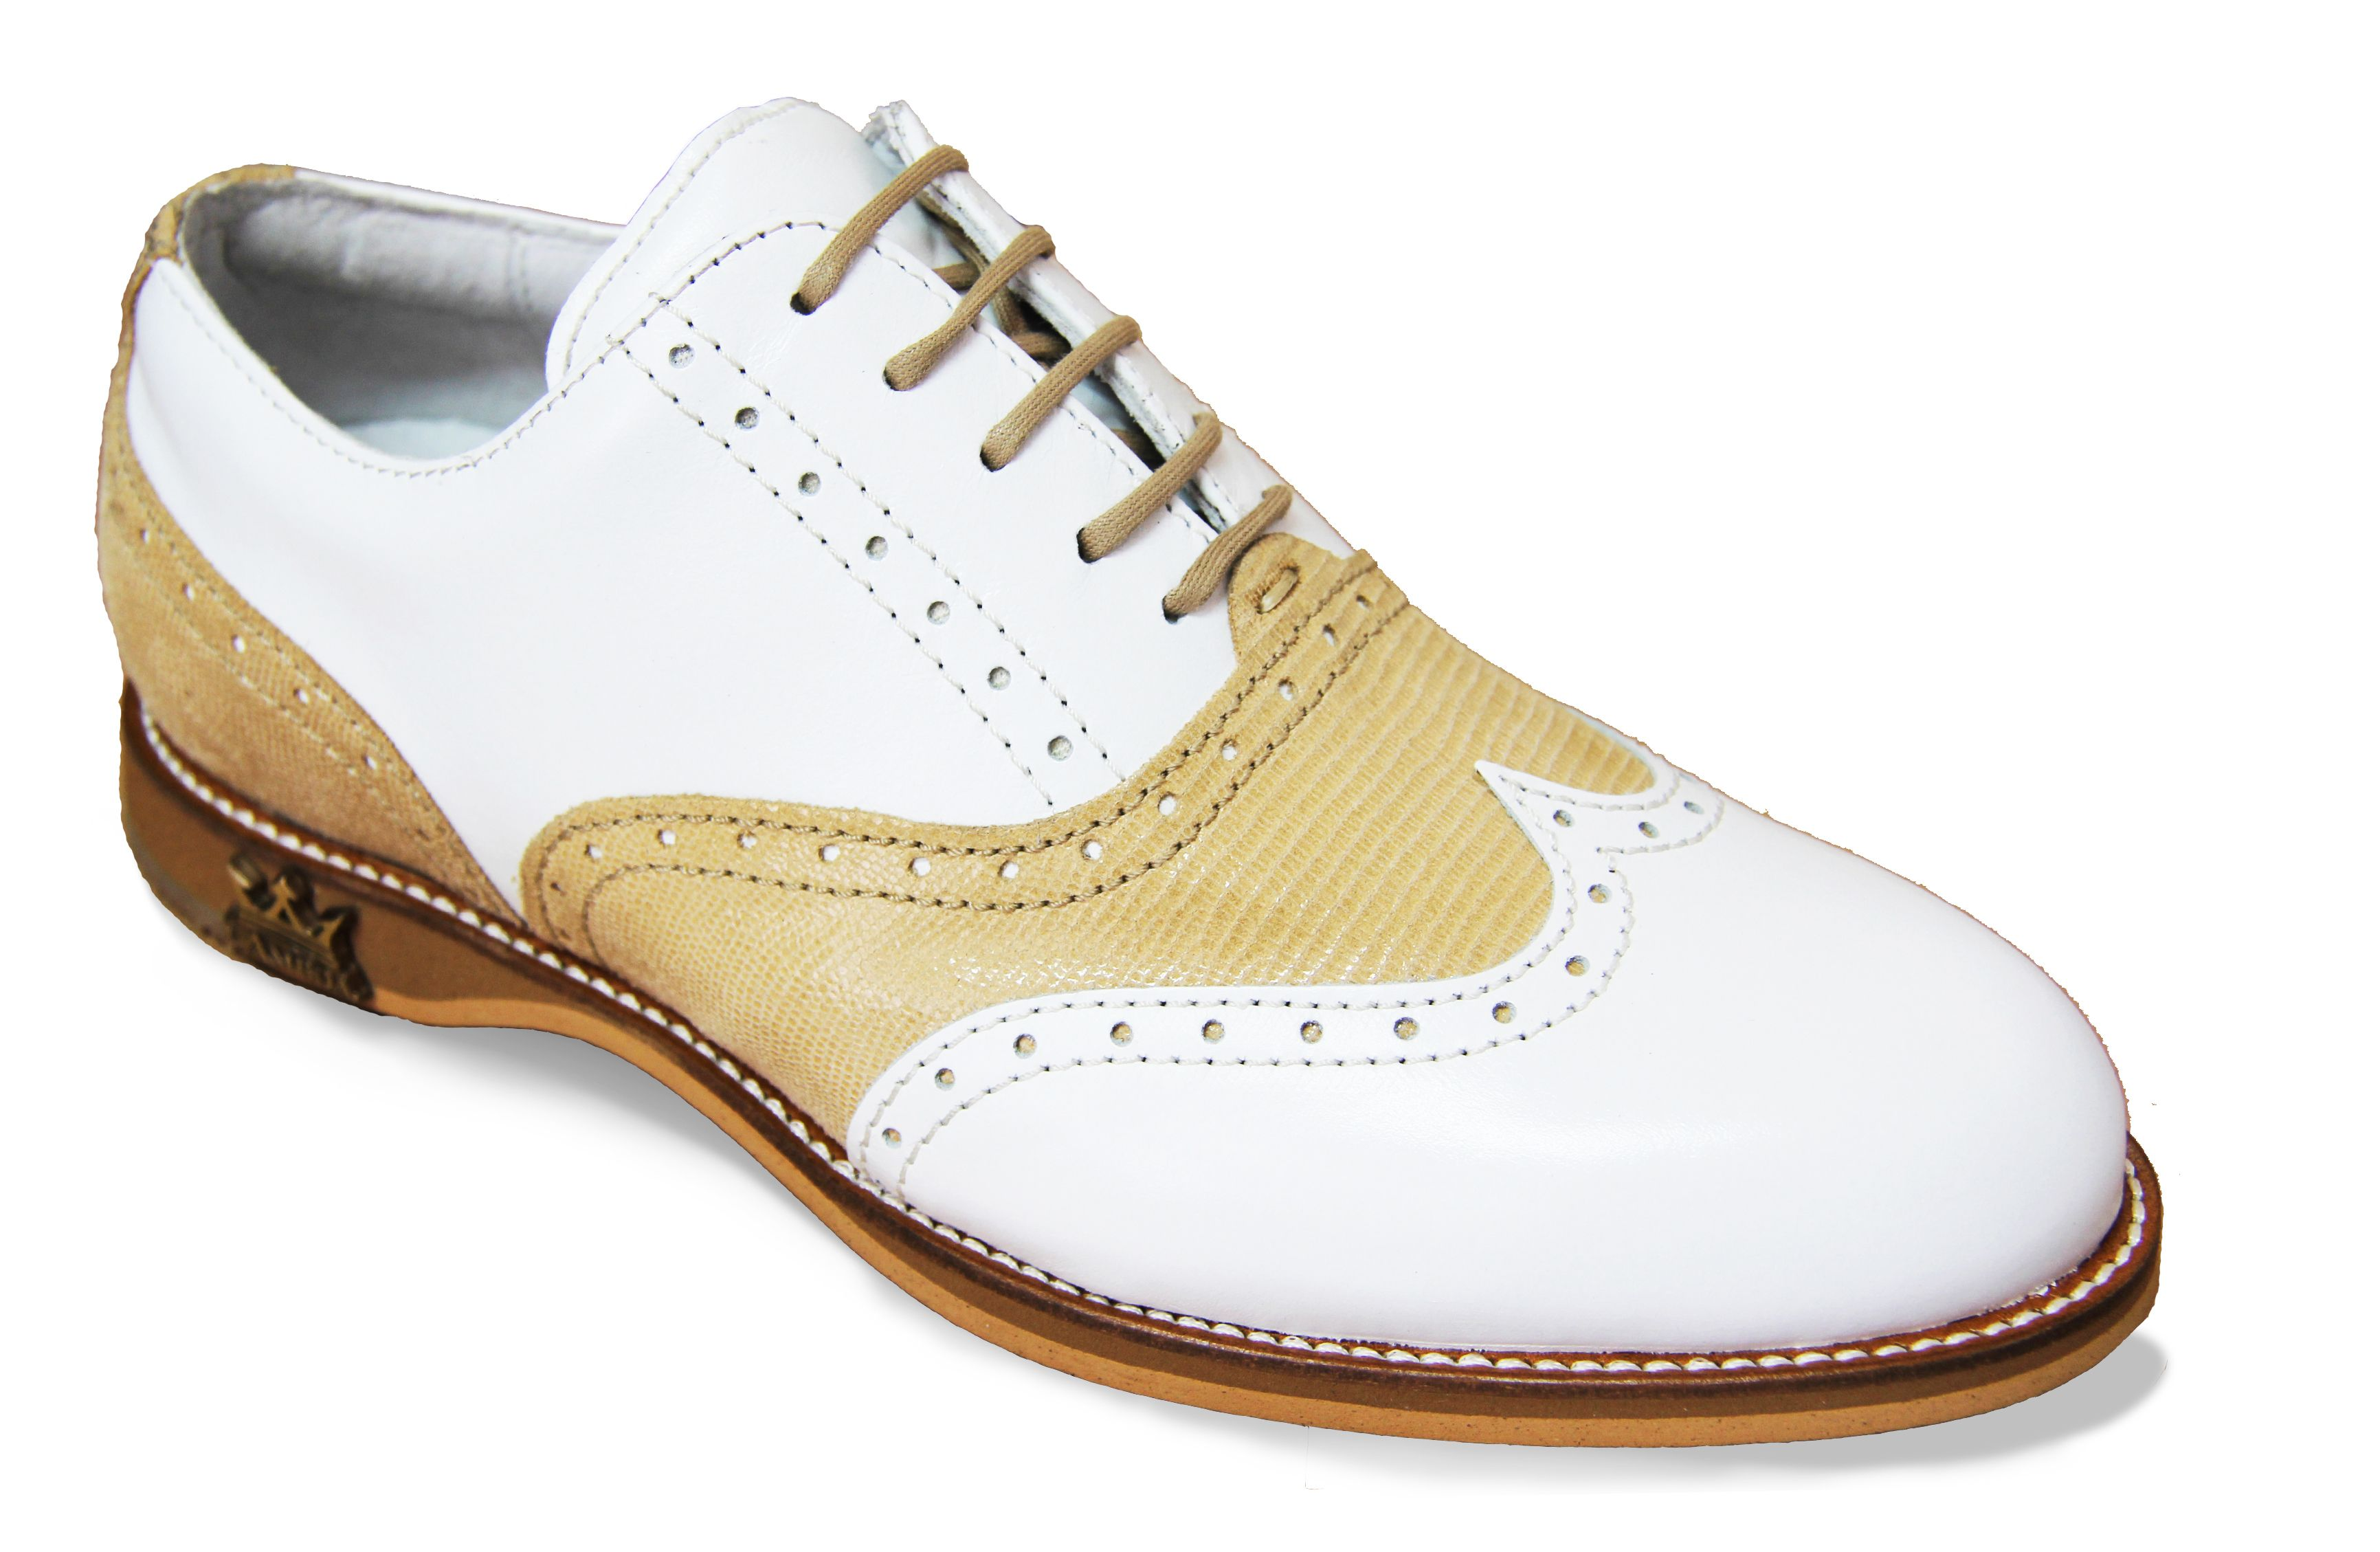 Lambda Golf Shoes